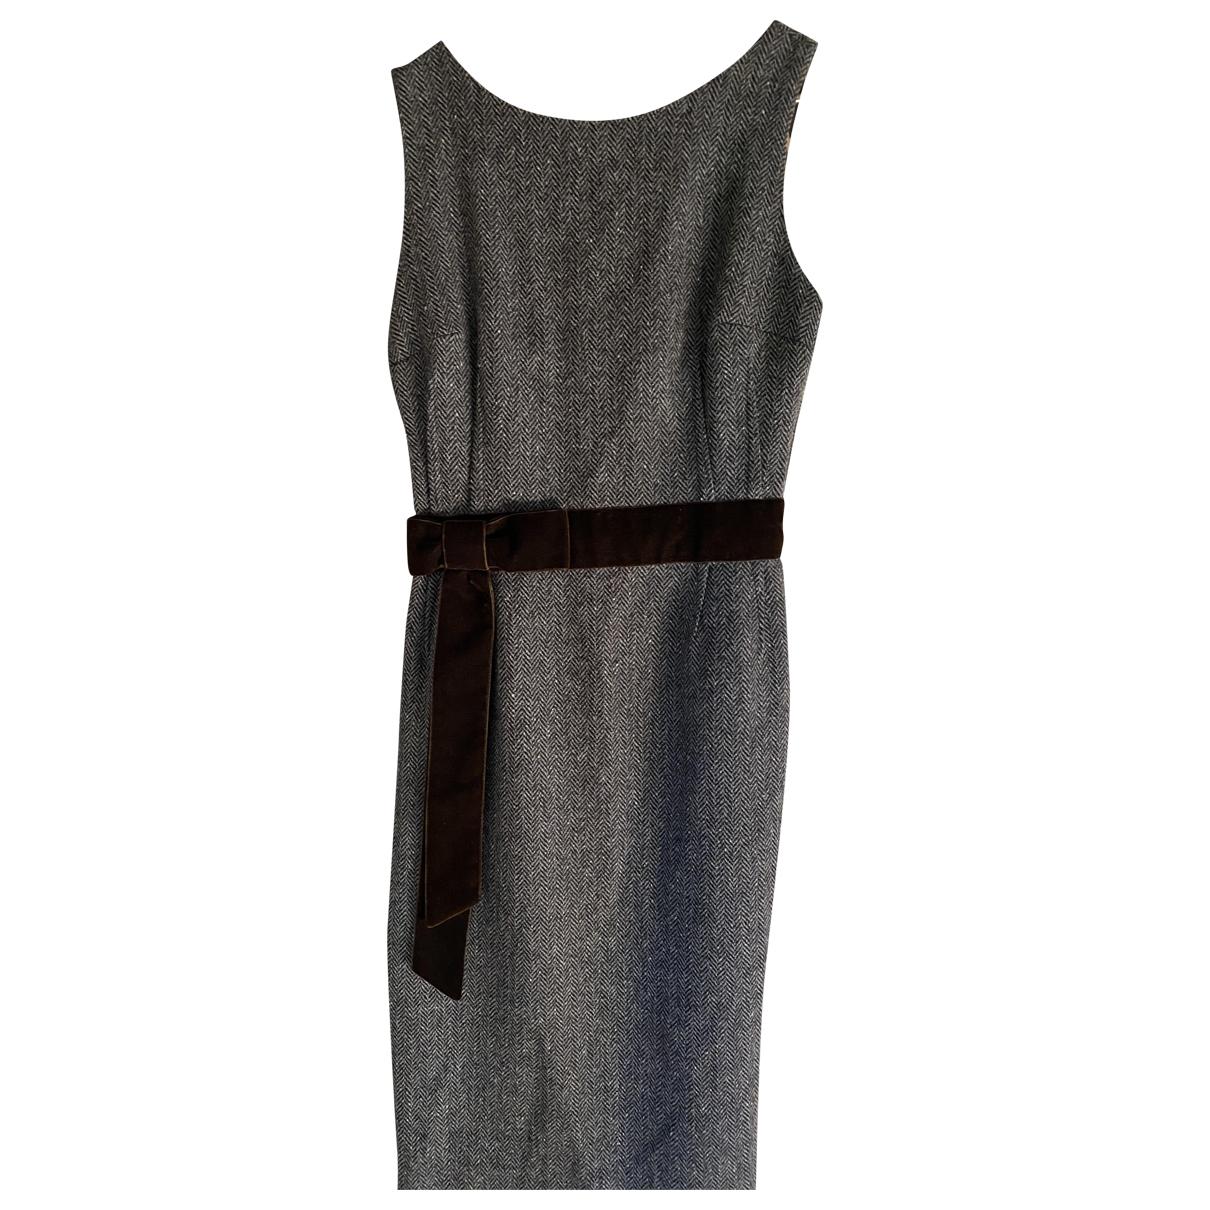 D&g \N Kleid in  Braun Wolle